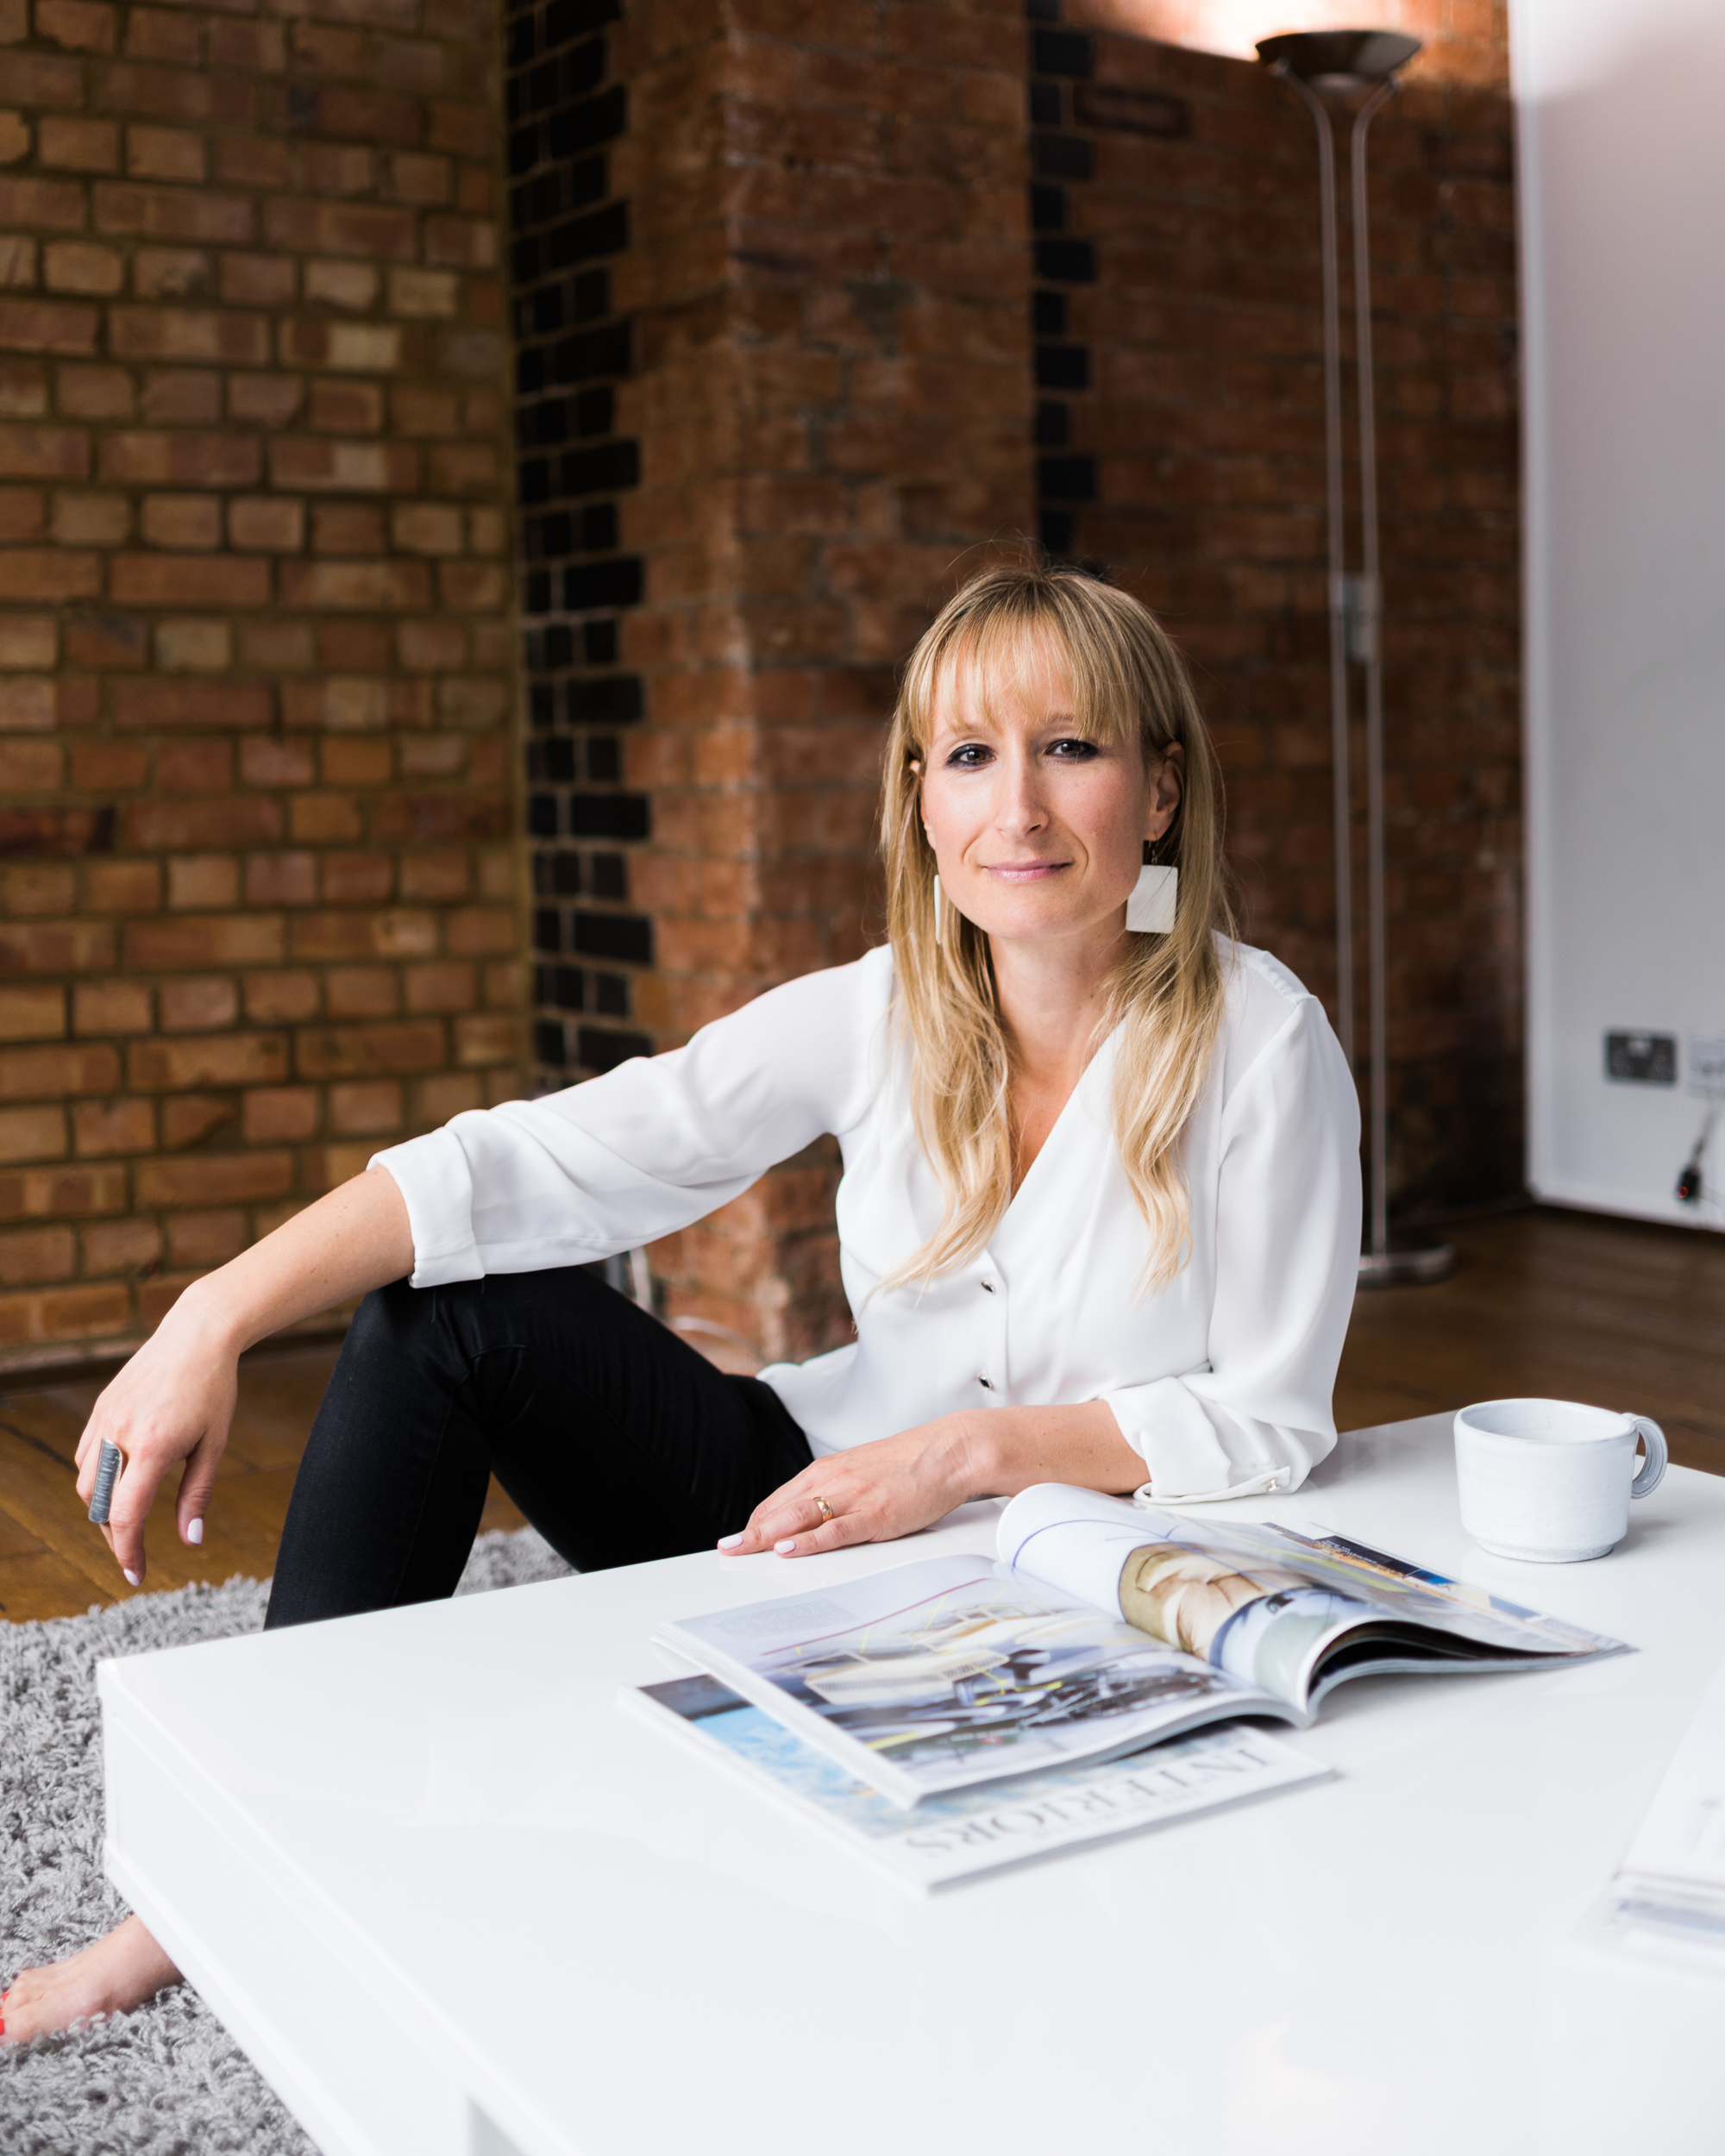 Jo Chrobak Interior Designer Personal Brand Photography London Becky Rui-003.jpg